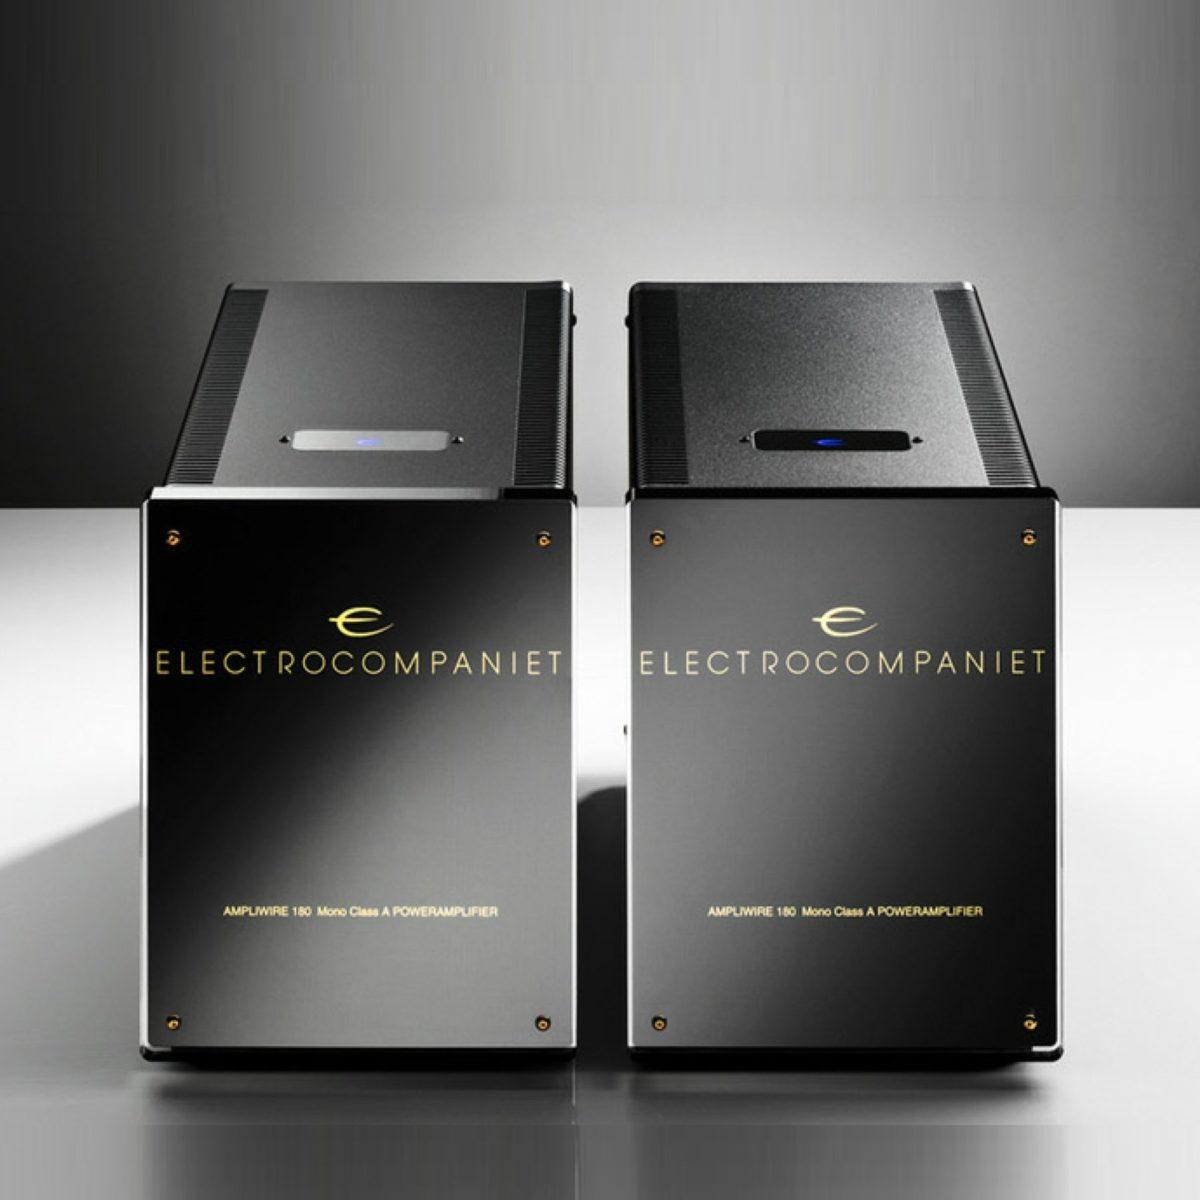 Electrocompaniet_AW180_highend_erősítő_monoblokk_2 - Professional Audio